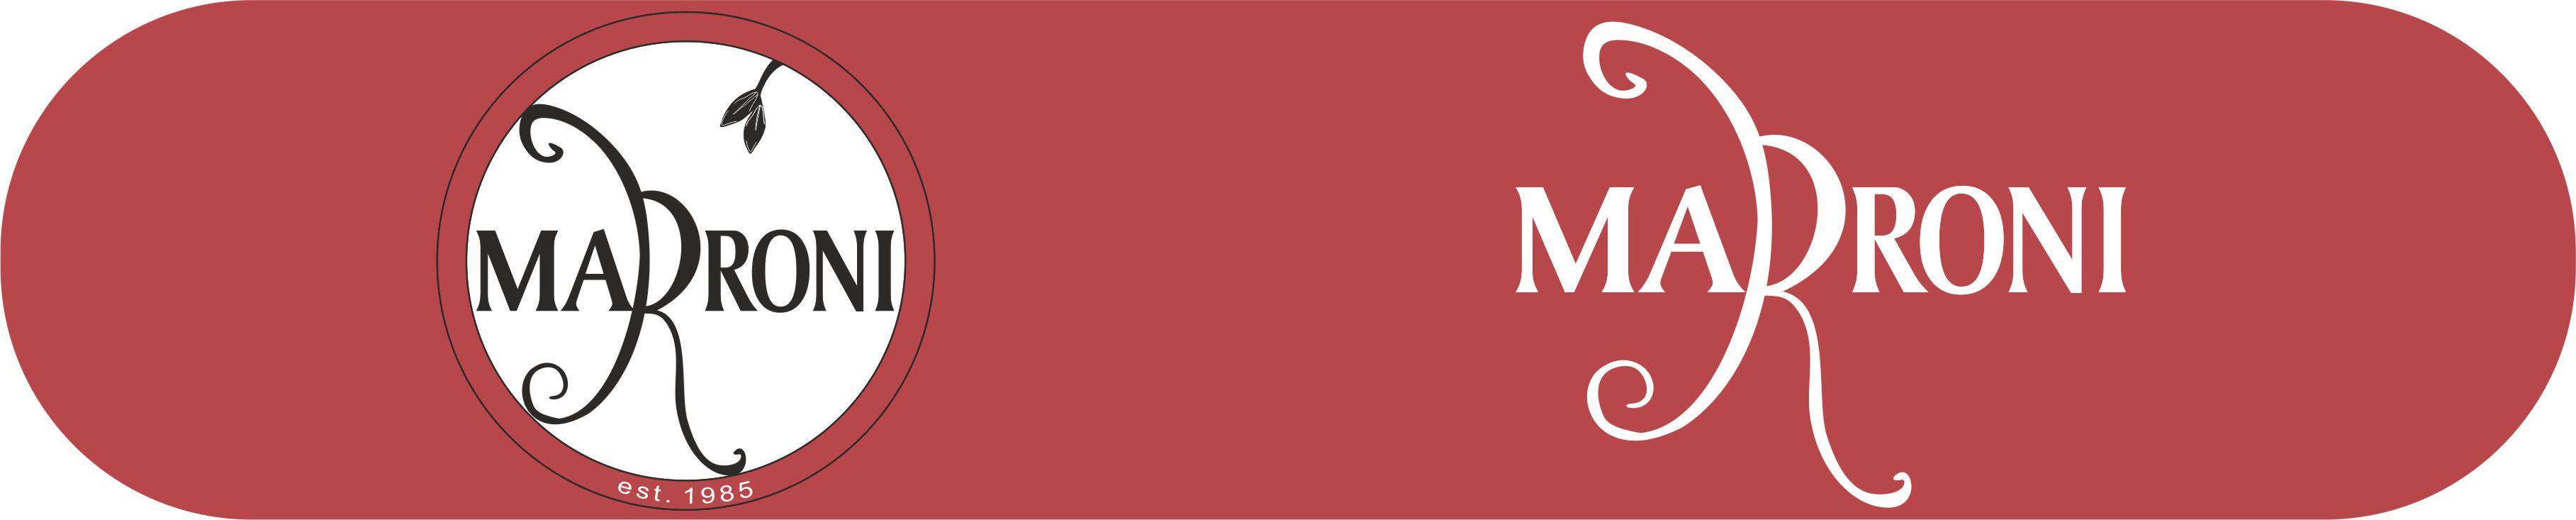 MARRONI FASHION - ΕΝΔΥΜΑΤΑ - ΥΠΟΔΗΜΑΤΑ - ΤΣΑΝΤΕΣ - ΒΑΛΙΤΣΕΣ - ΧΟΝΔΡΙΚΗ  ΠΩΛΗΣΗ 92ebad064cc